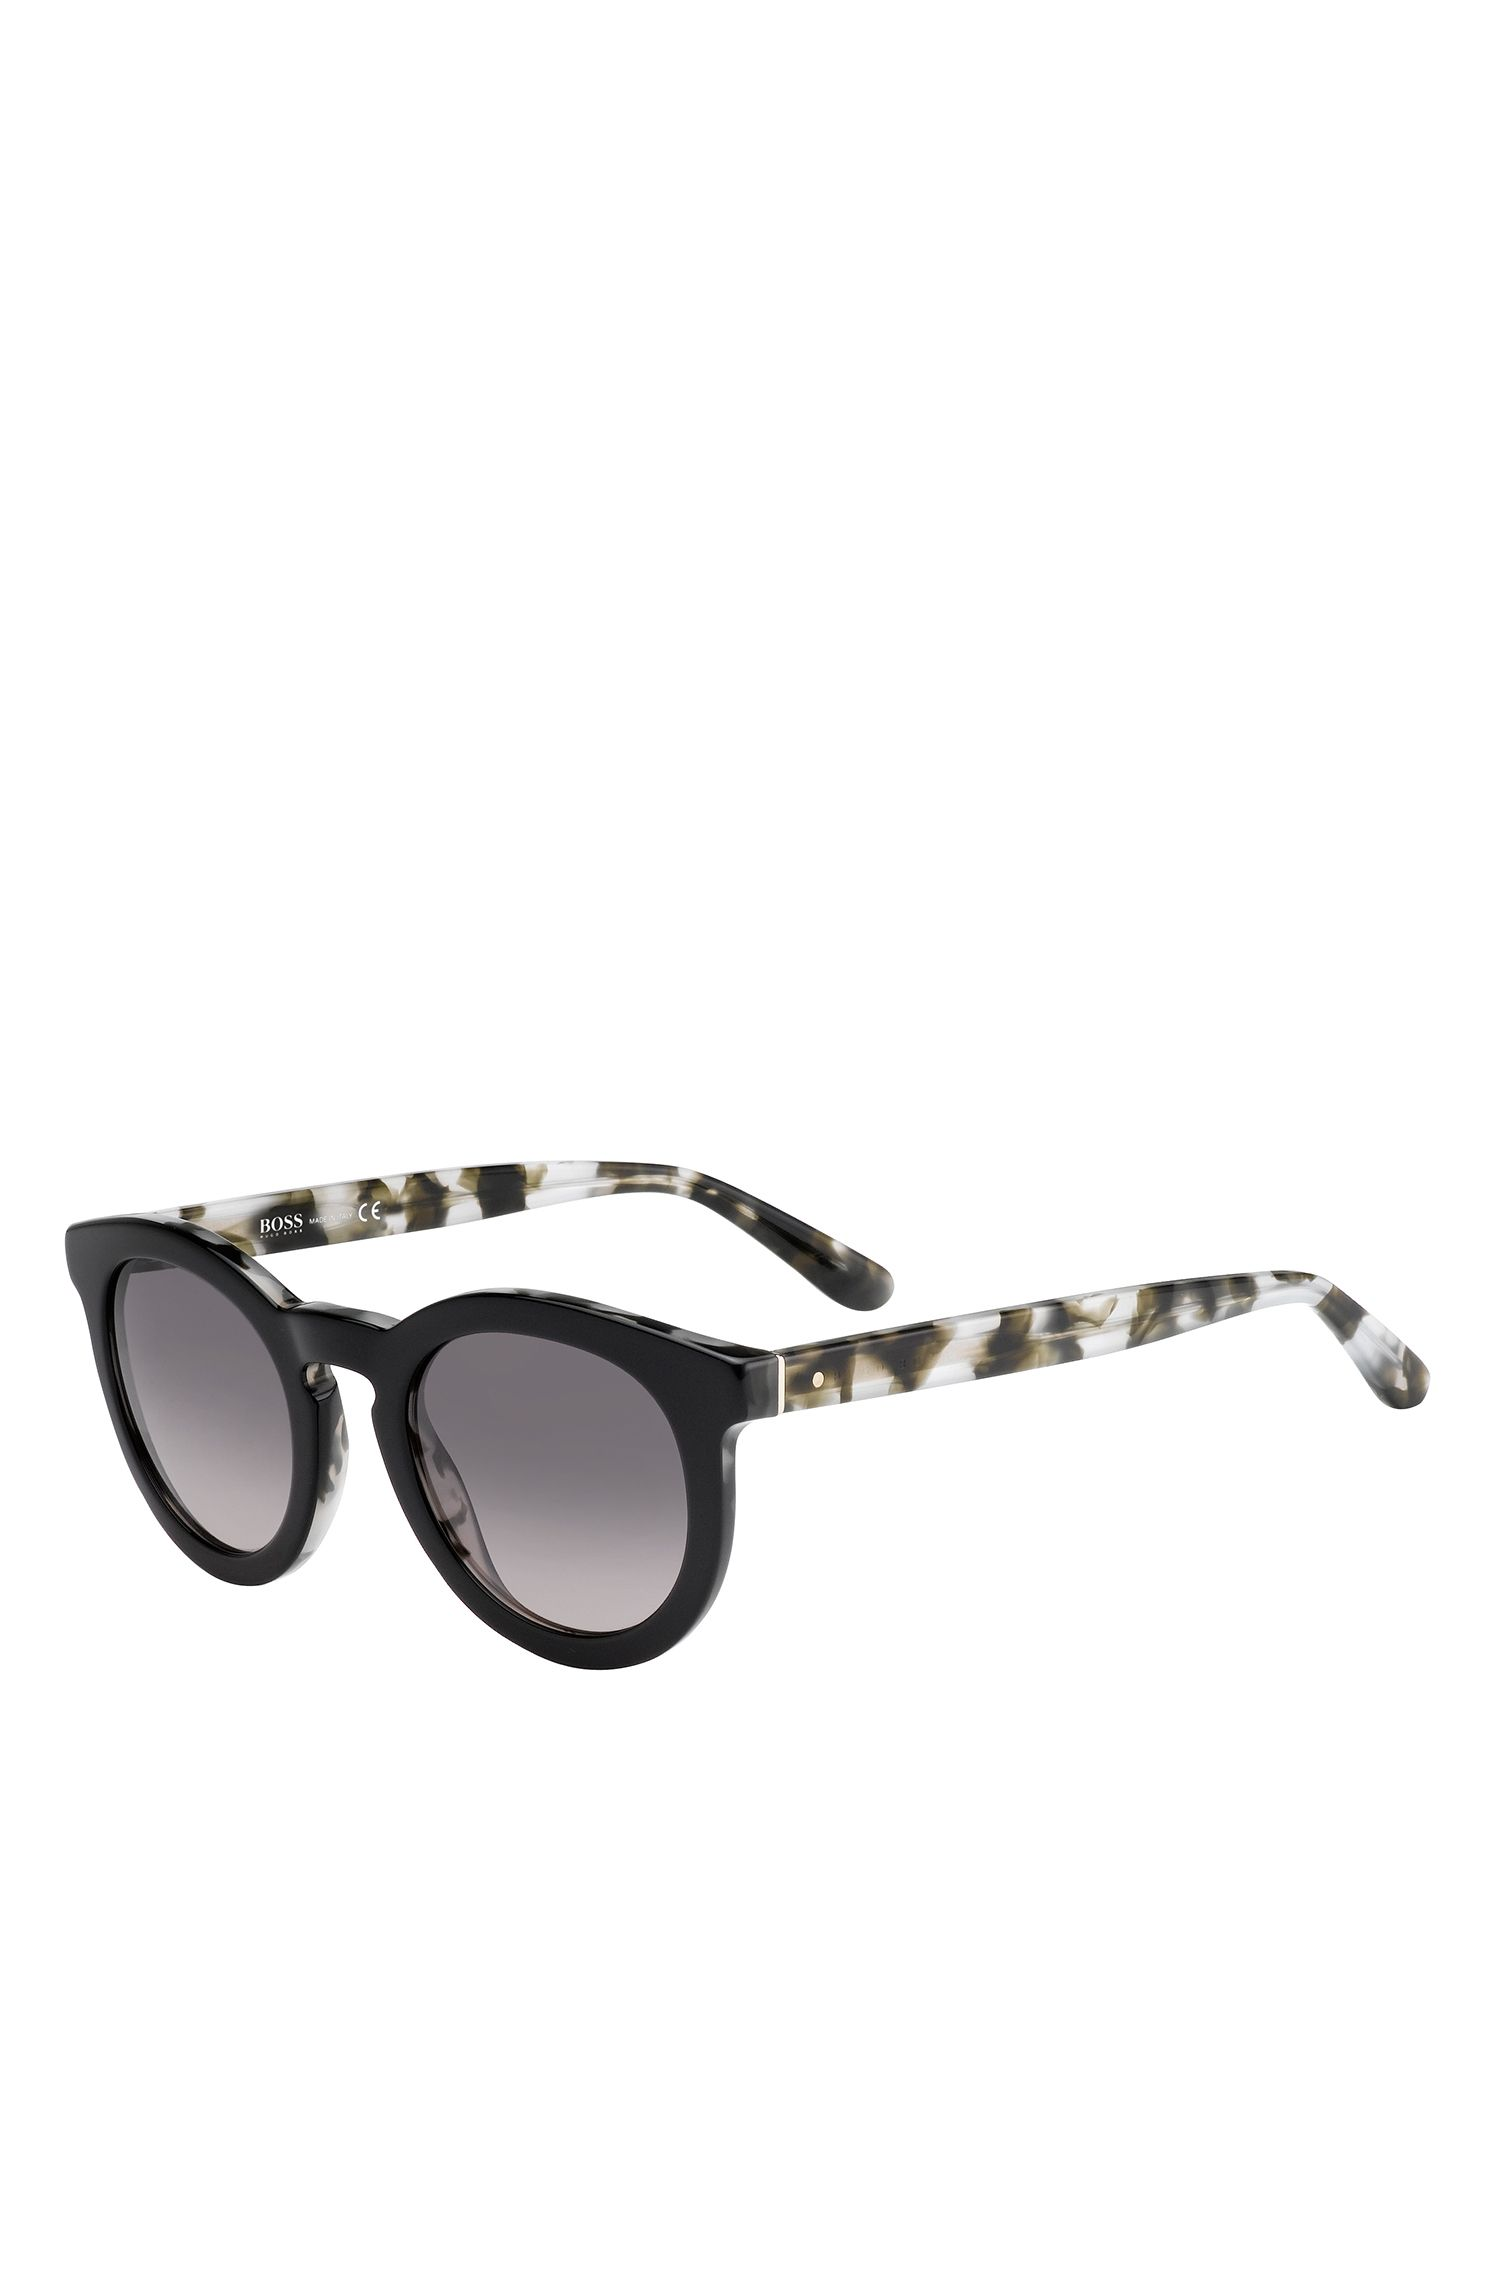 'BOSS 0742S'   Gradient Lenses Roud Cateye Sunglasses